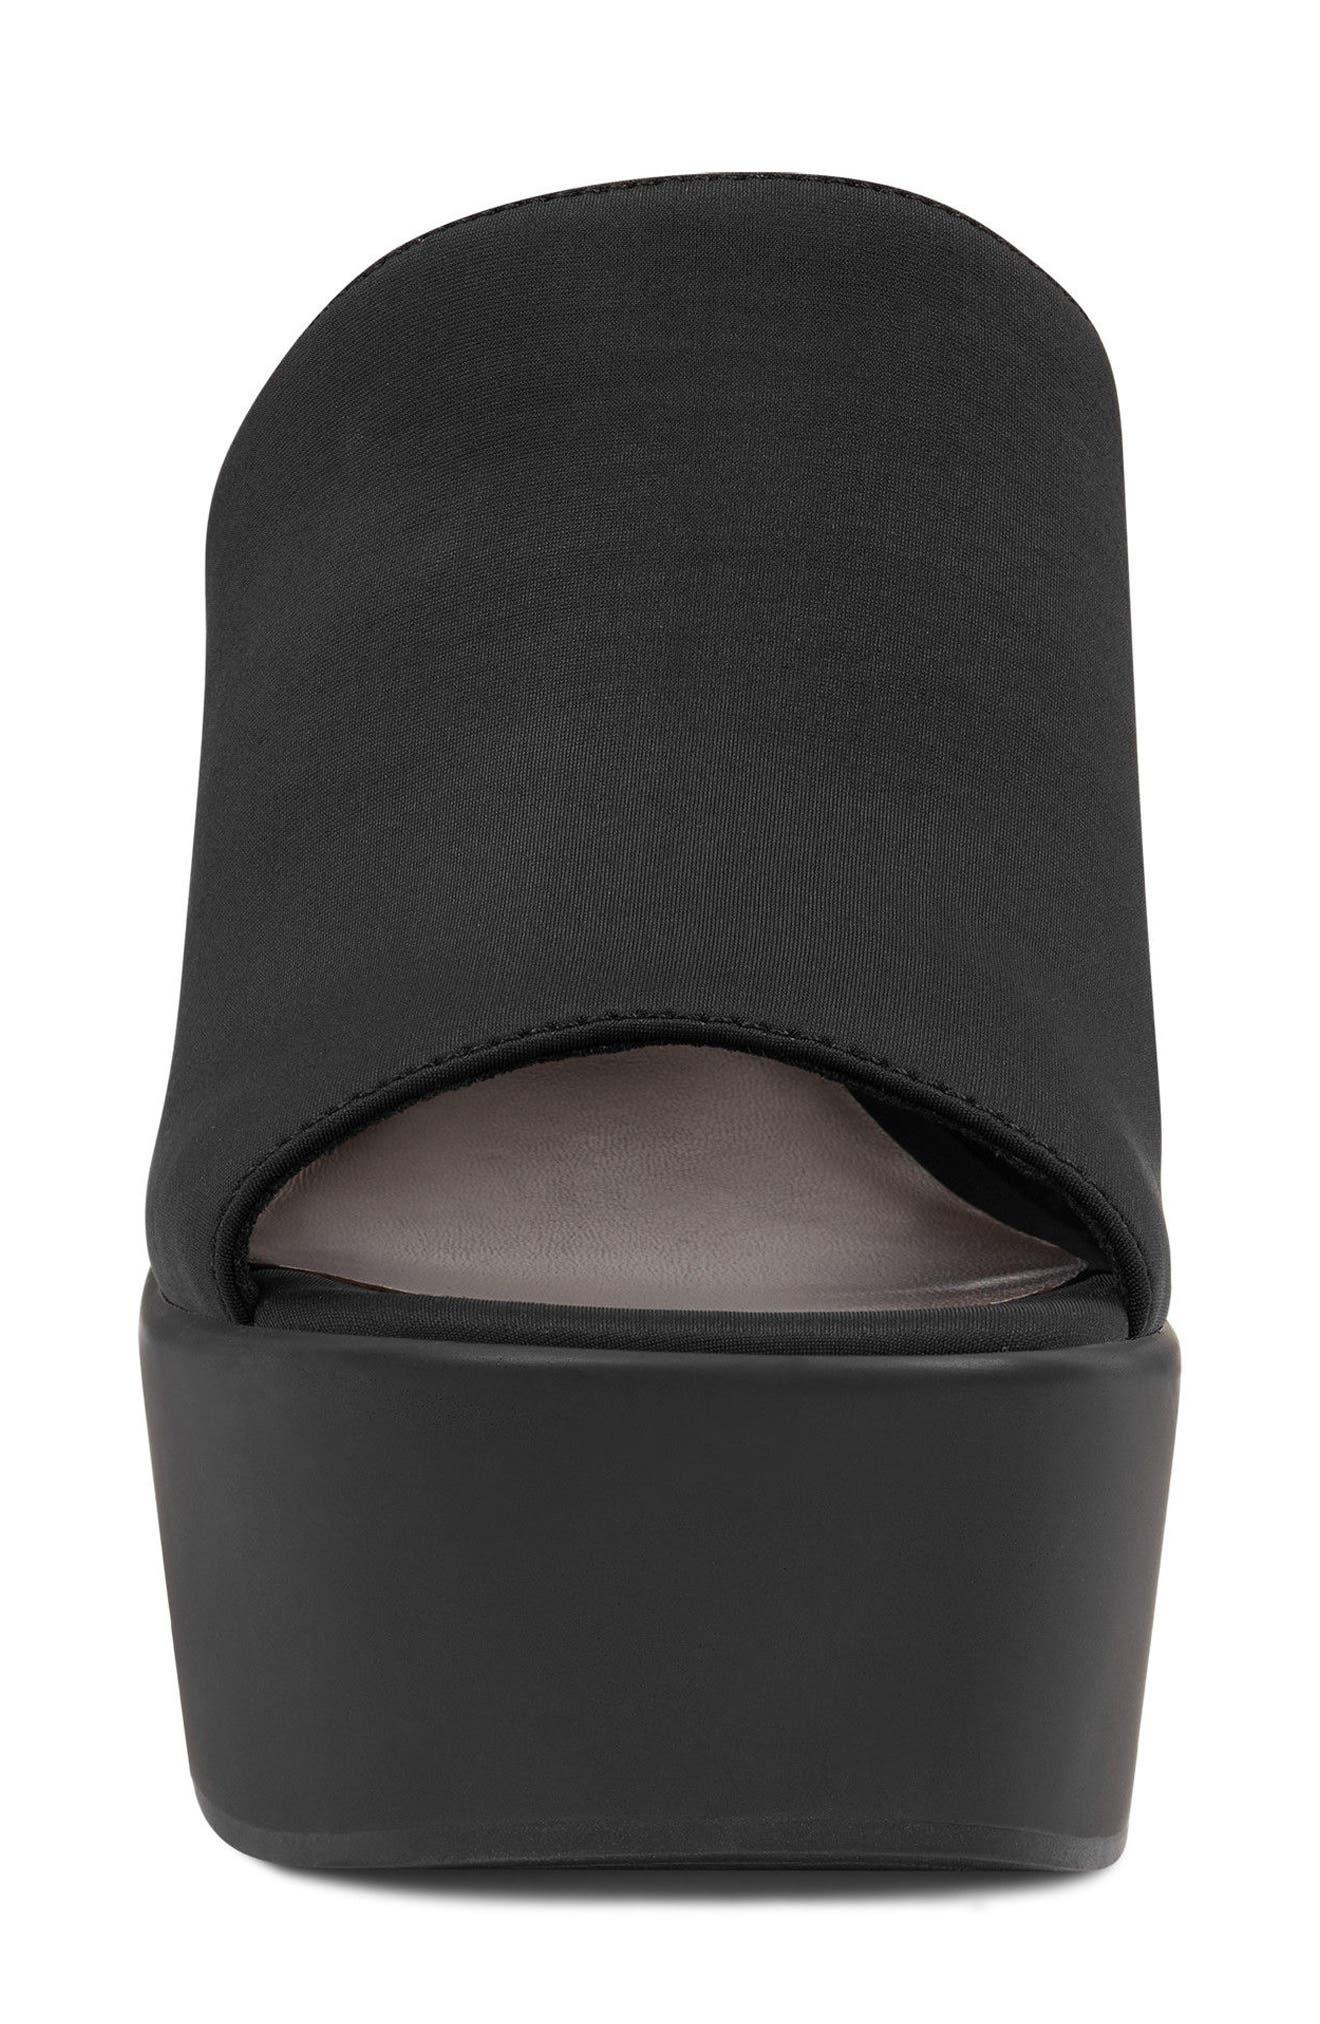 Tomo - 40th Anniversary Capsule Collection Platform Sandal,                             Alternate thumbnail 4, color,                             BLACK FABRIC